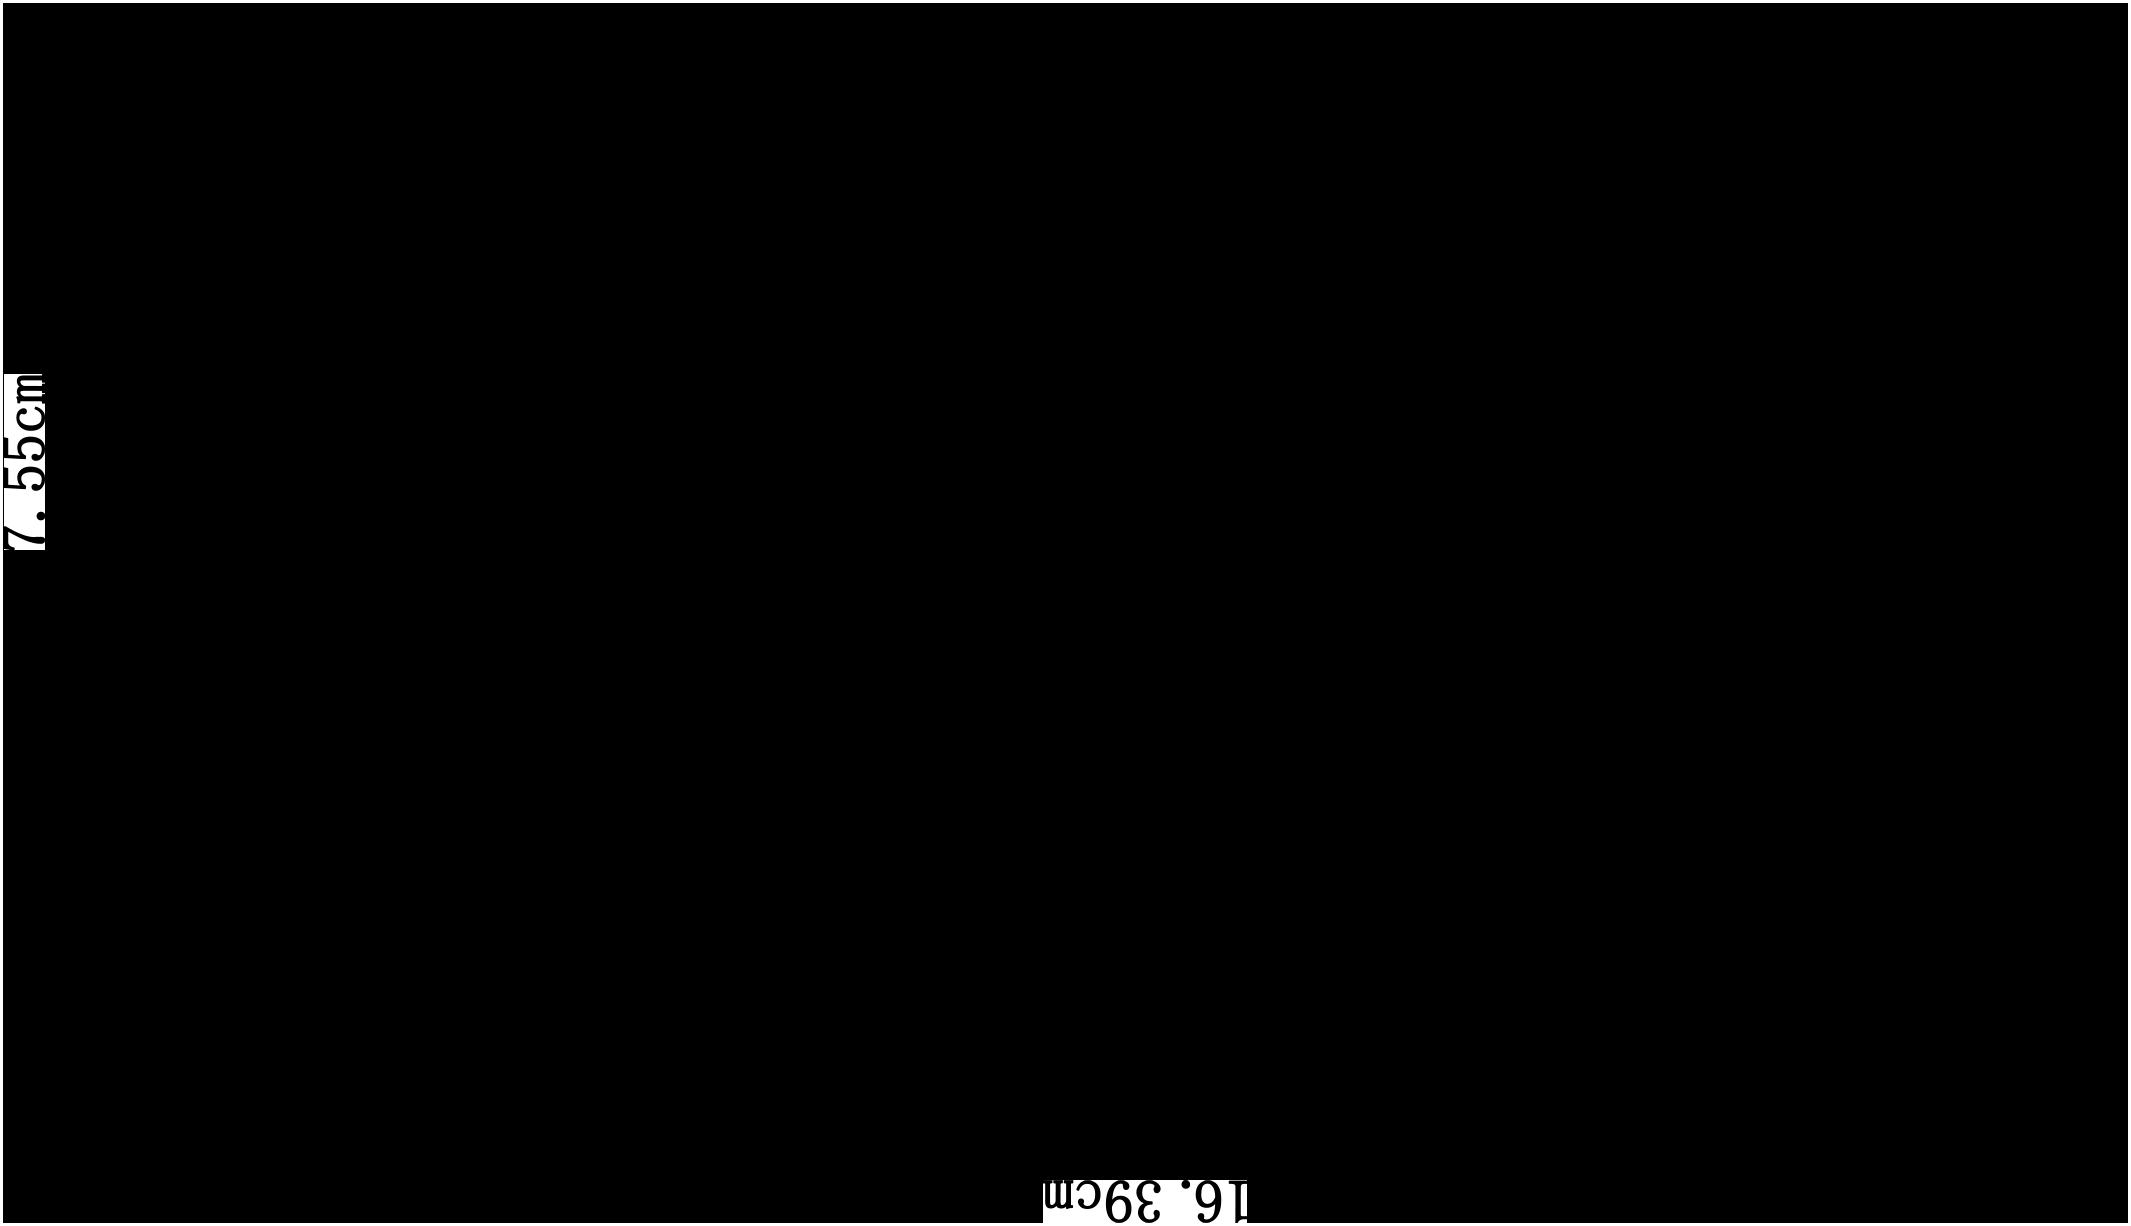 OPPO A31 Dimension Image